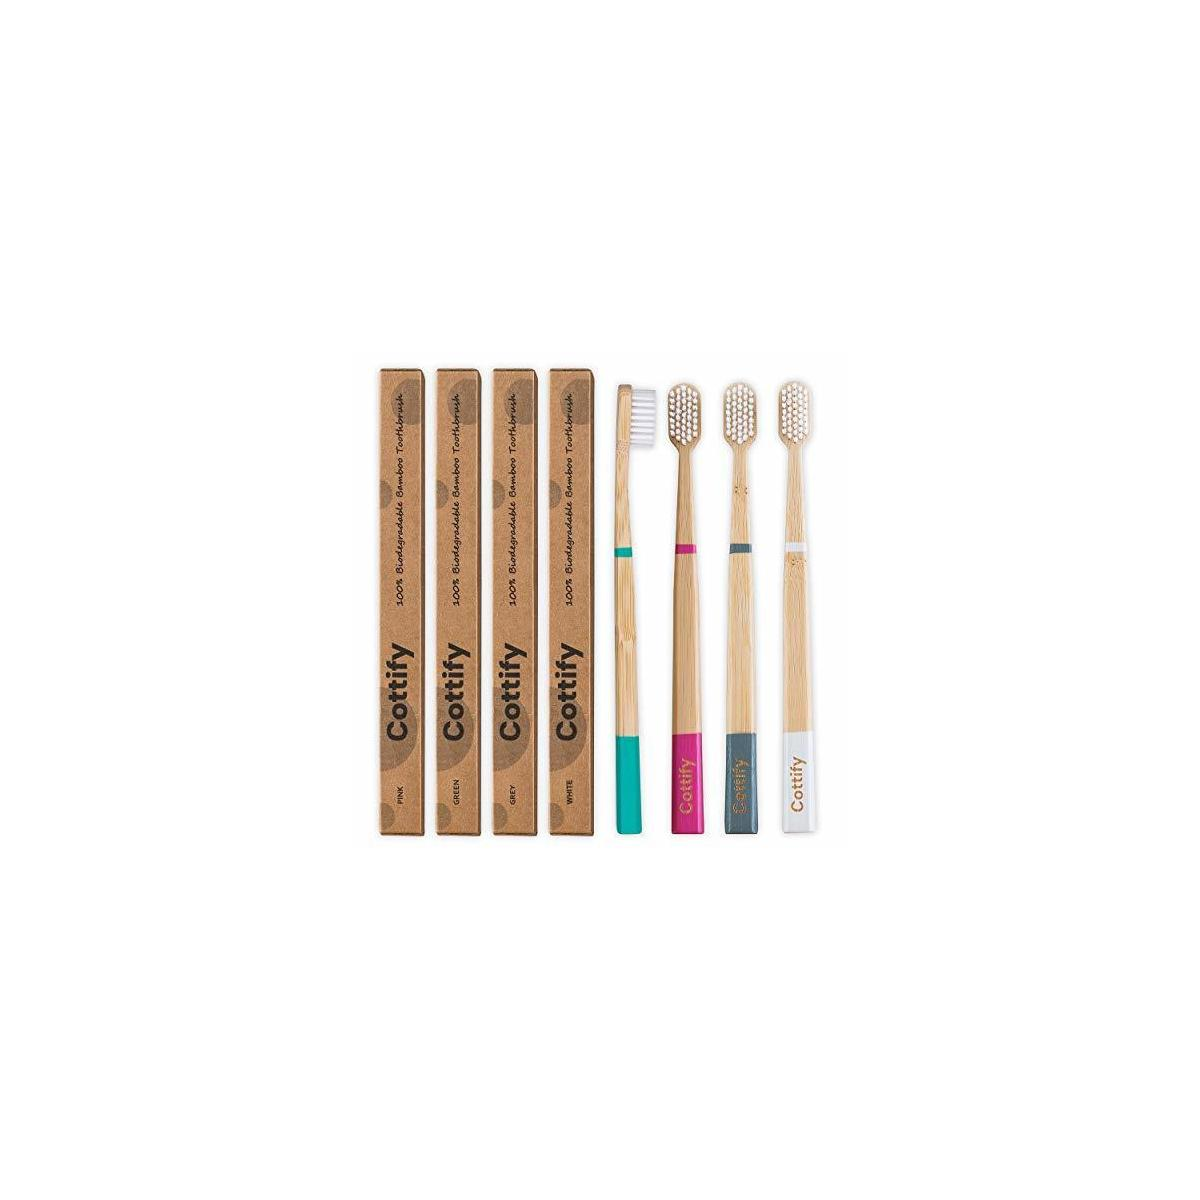 4 Pack of Premium Natural Organic Bamboo Toothbrush – BPA Free Soft Bristles | Biodegradable | Vegan | Organic | Eco Sustainable Wooden Tooth Brush | Functional | 4 colors (GREEN, WHITE, PINK, GREY)